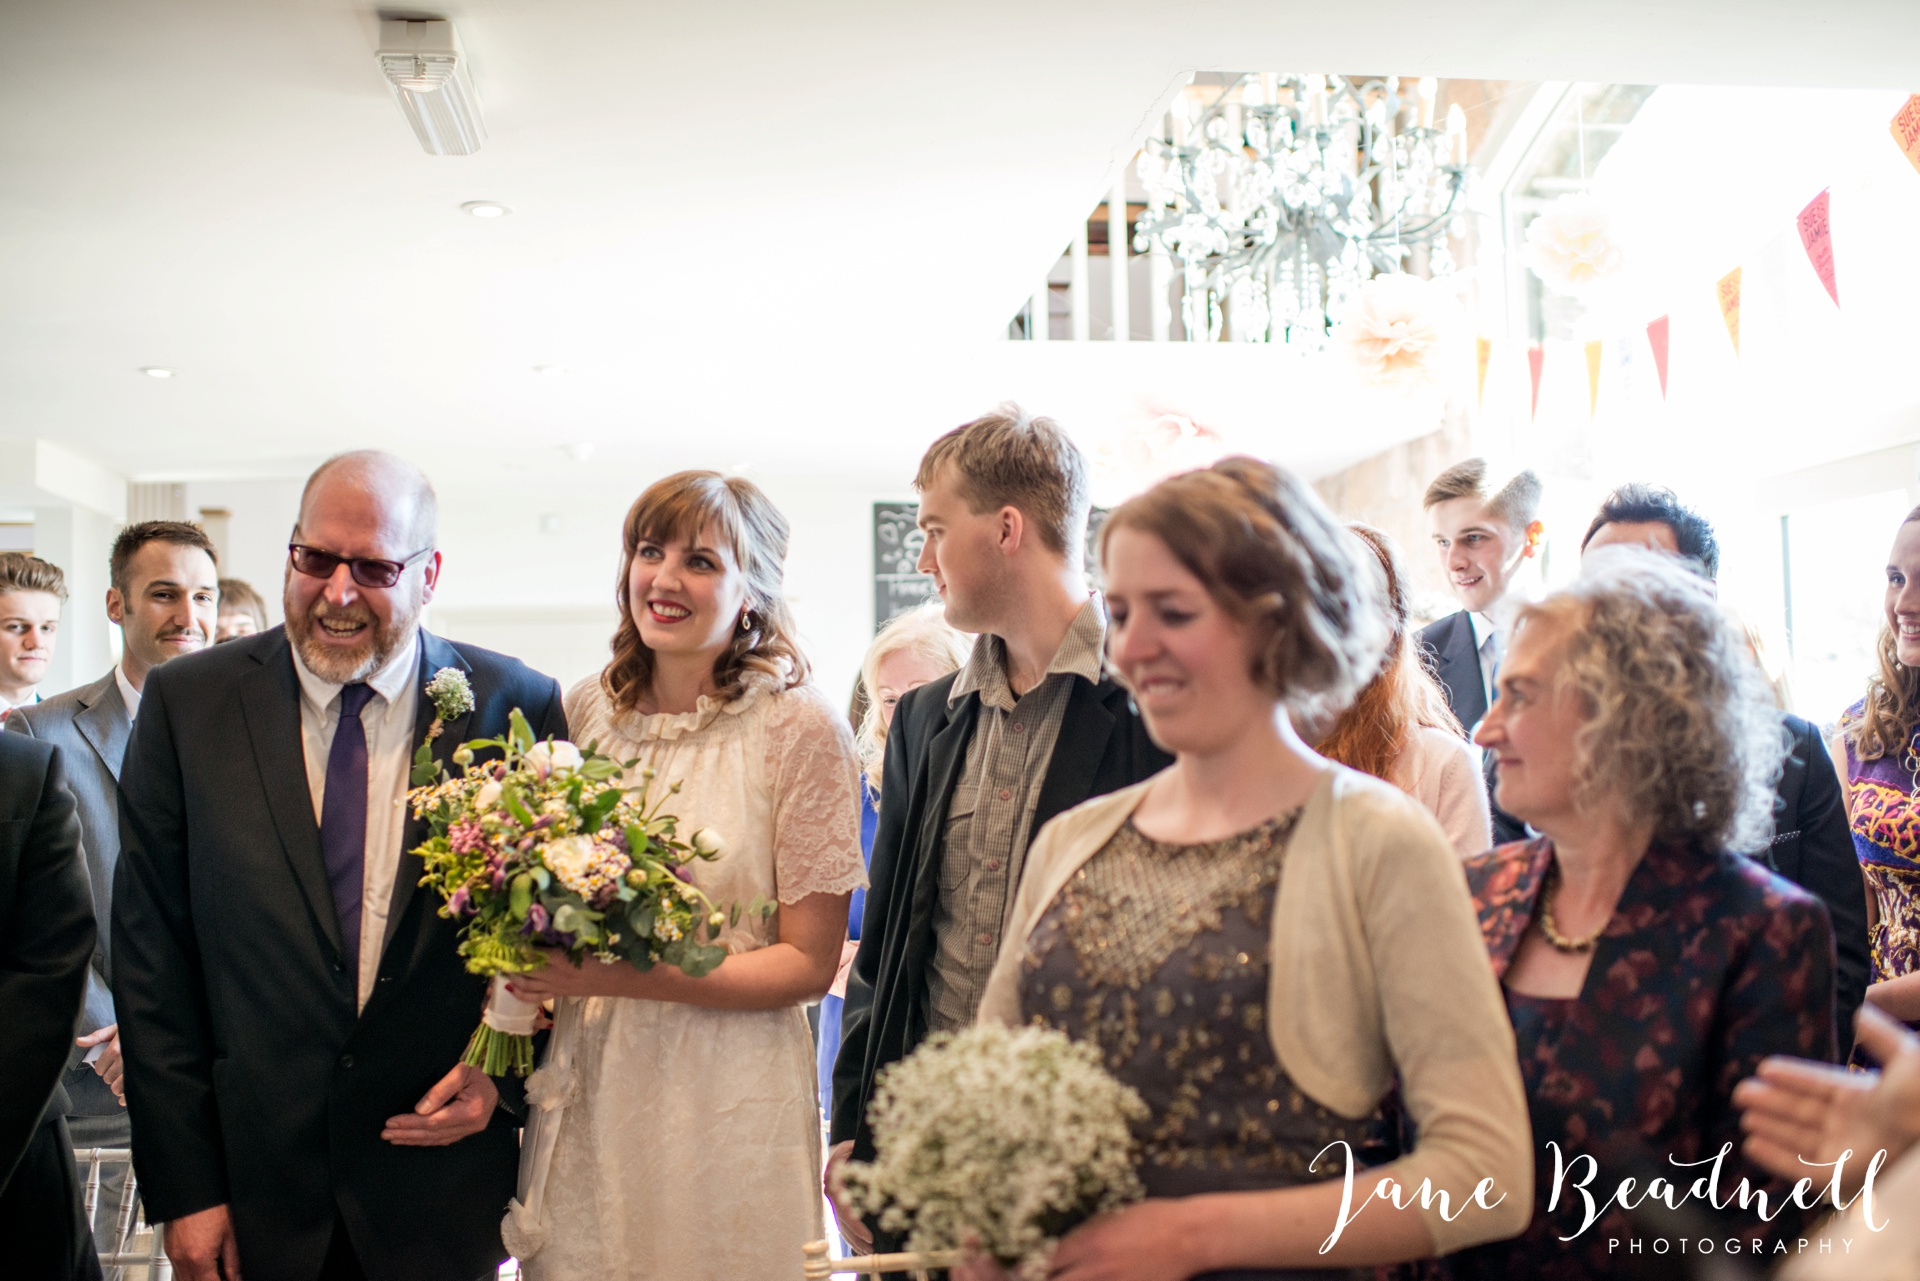 Jane Beadnell fine art wedding photographer The Cheerful Chilli Barn Otley_0014